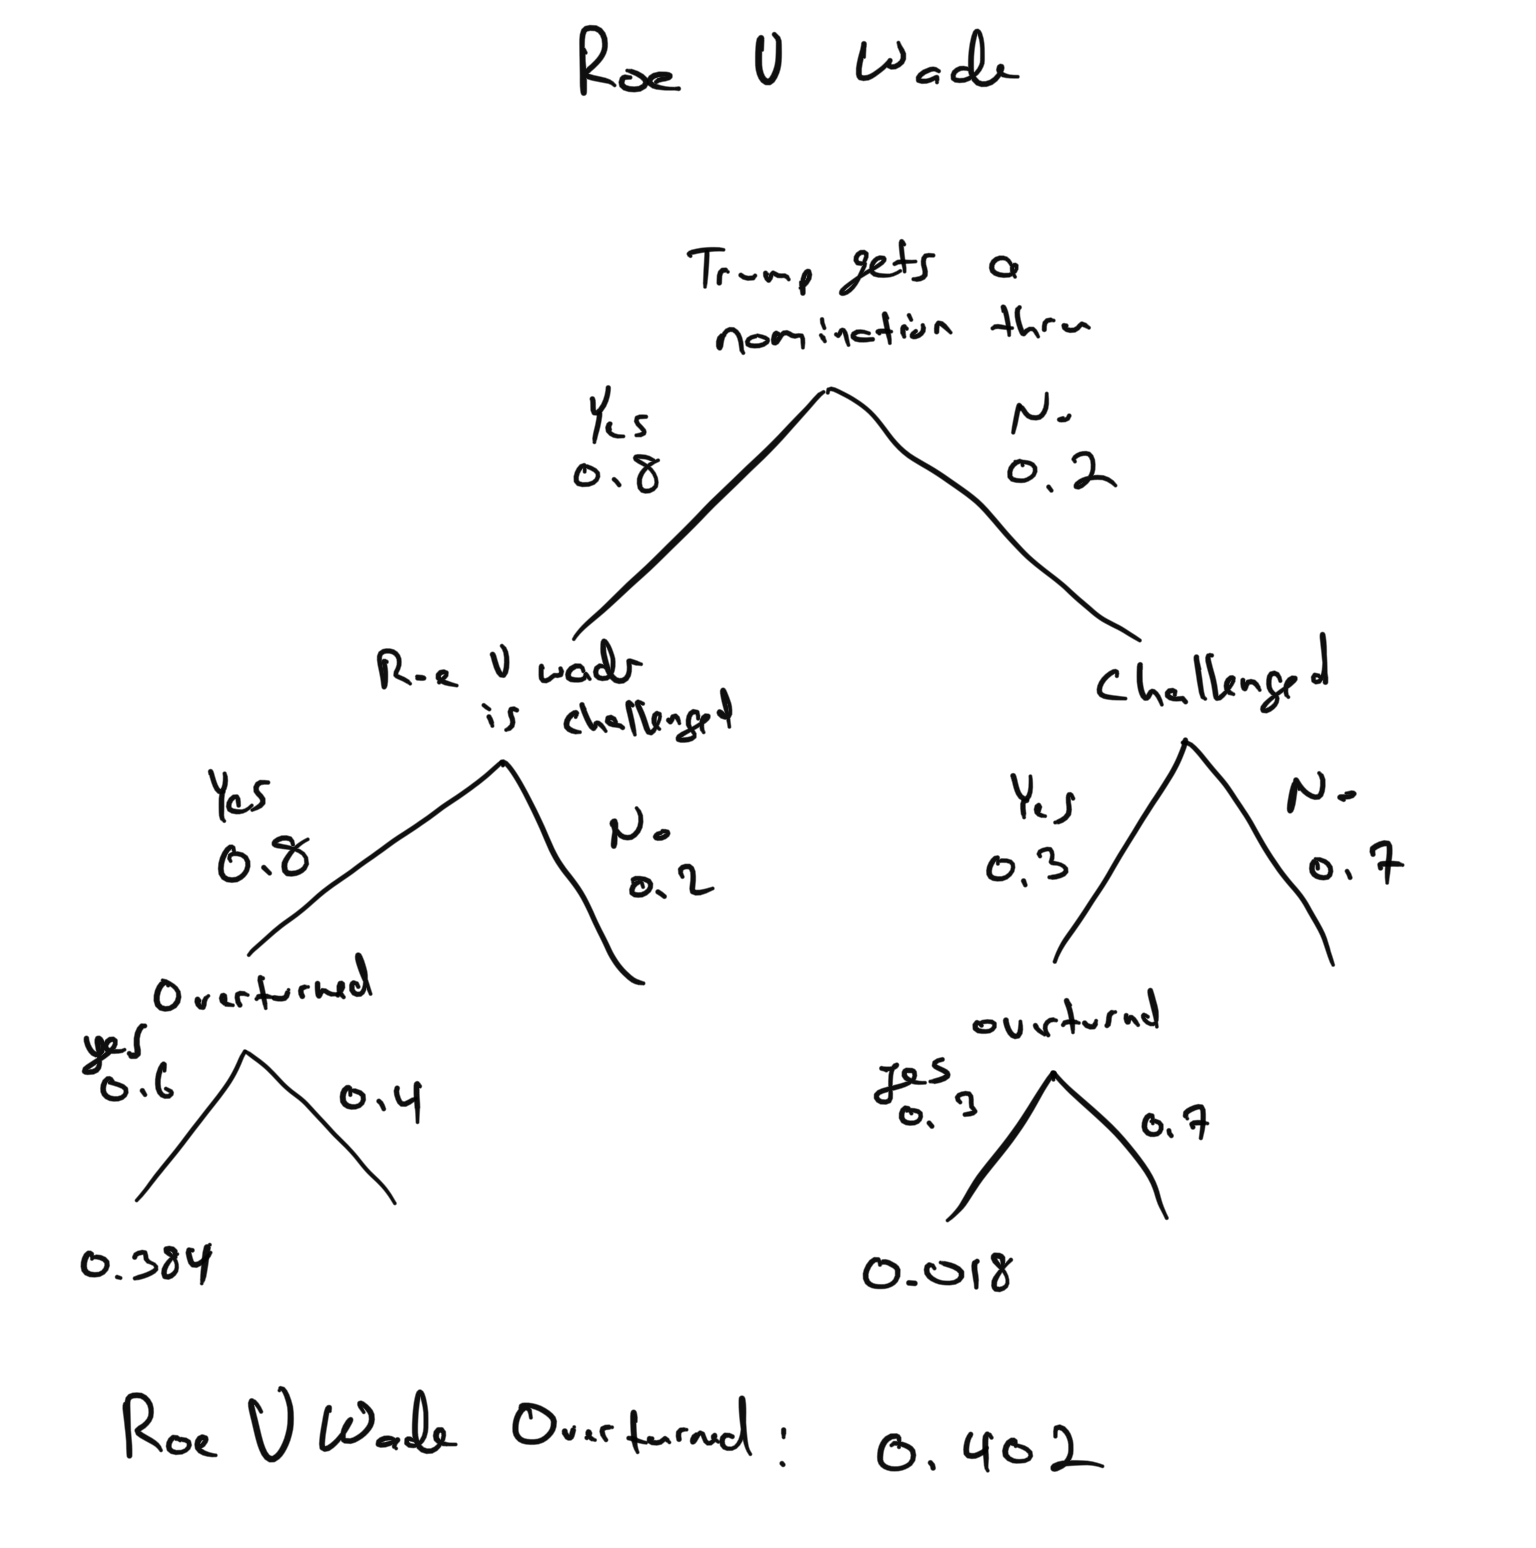 Roe vs Wade decomposition